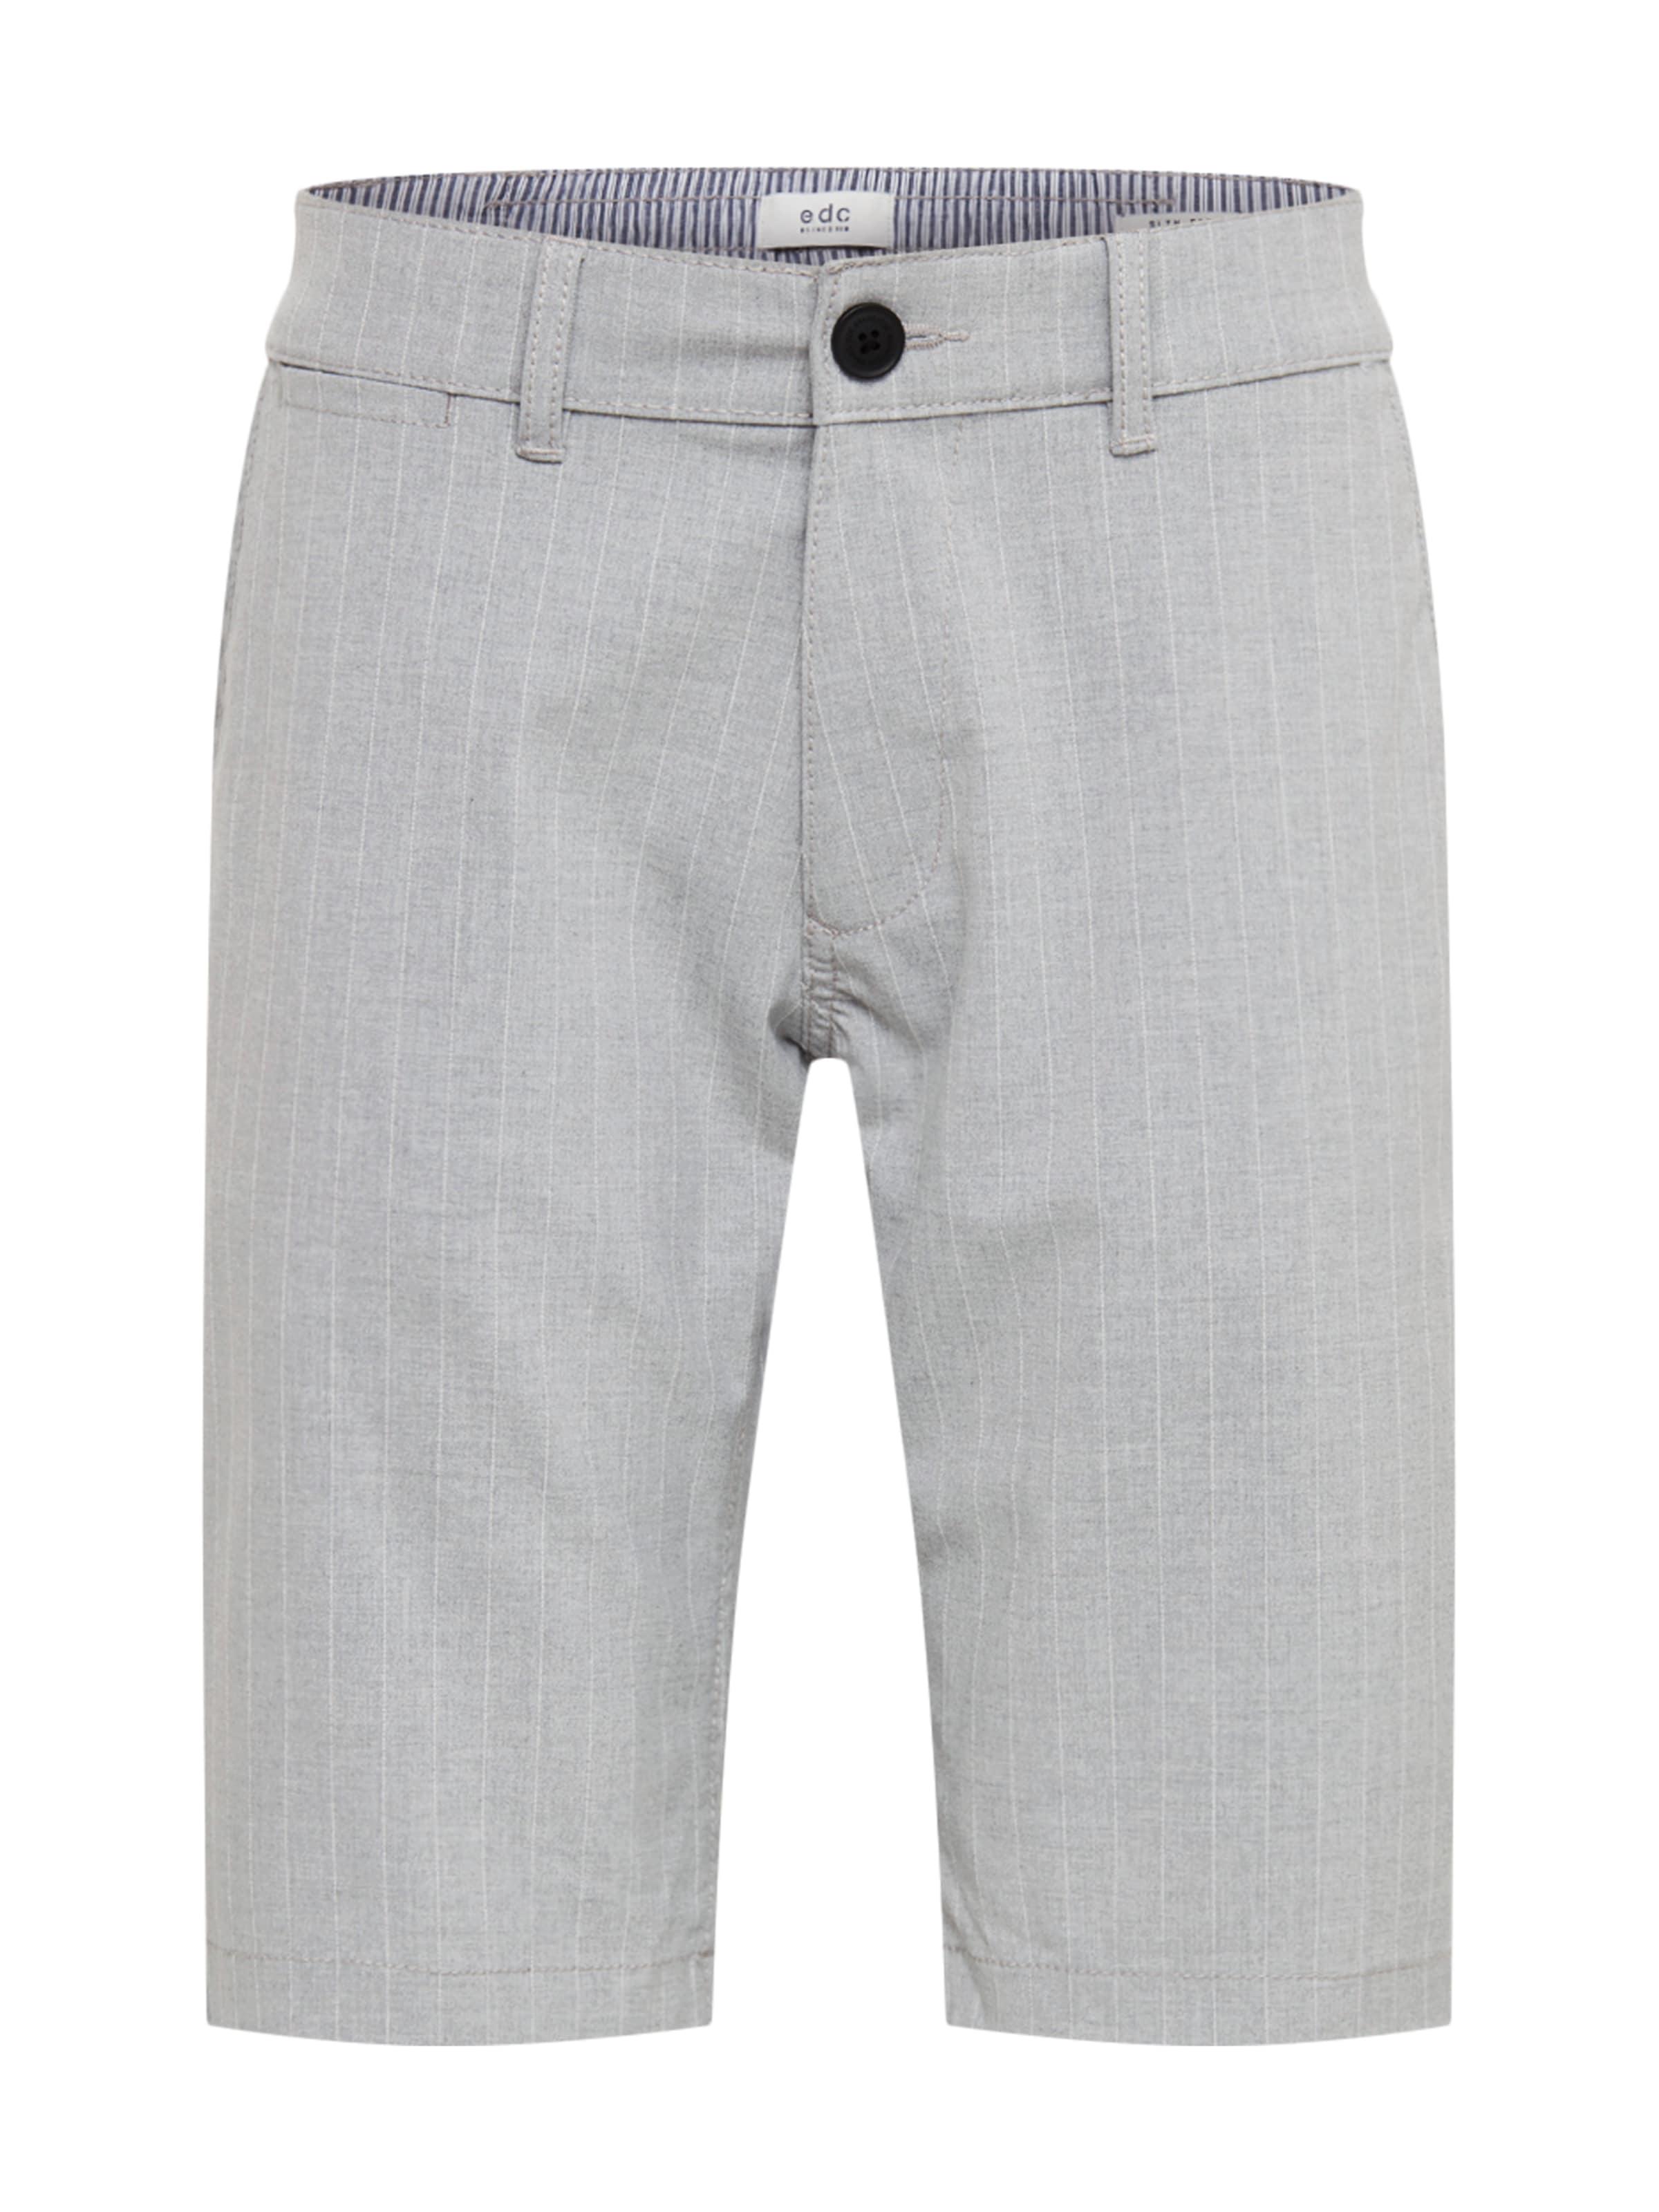 Grau Edc Esprit By '3d In Storts' Shorts Pinst MGSUpLqzjV